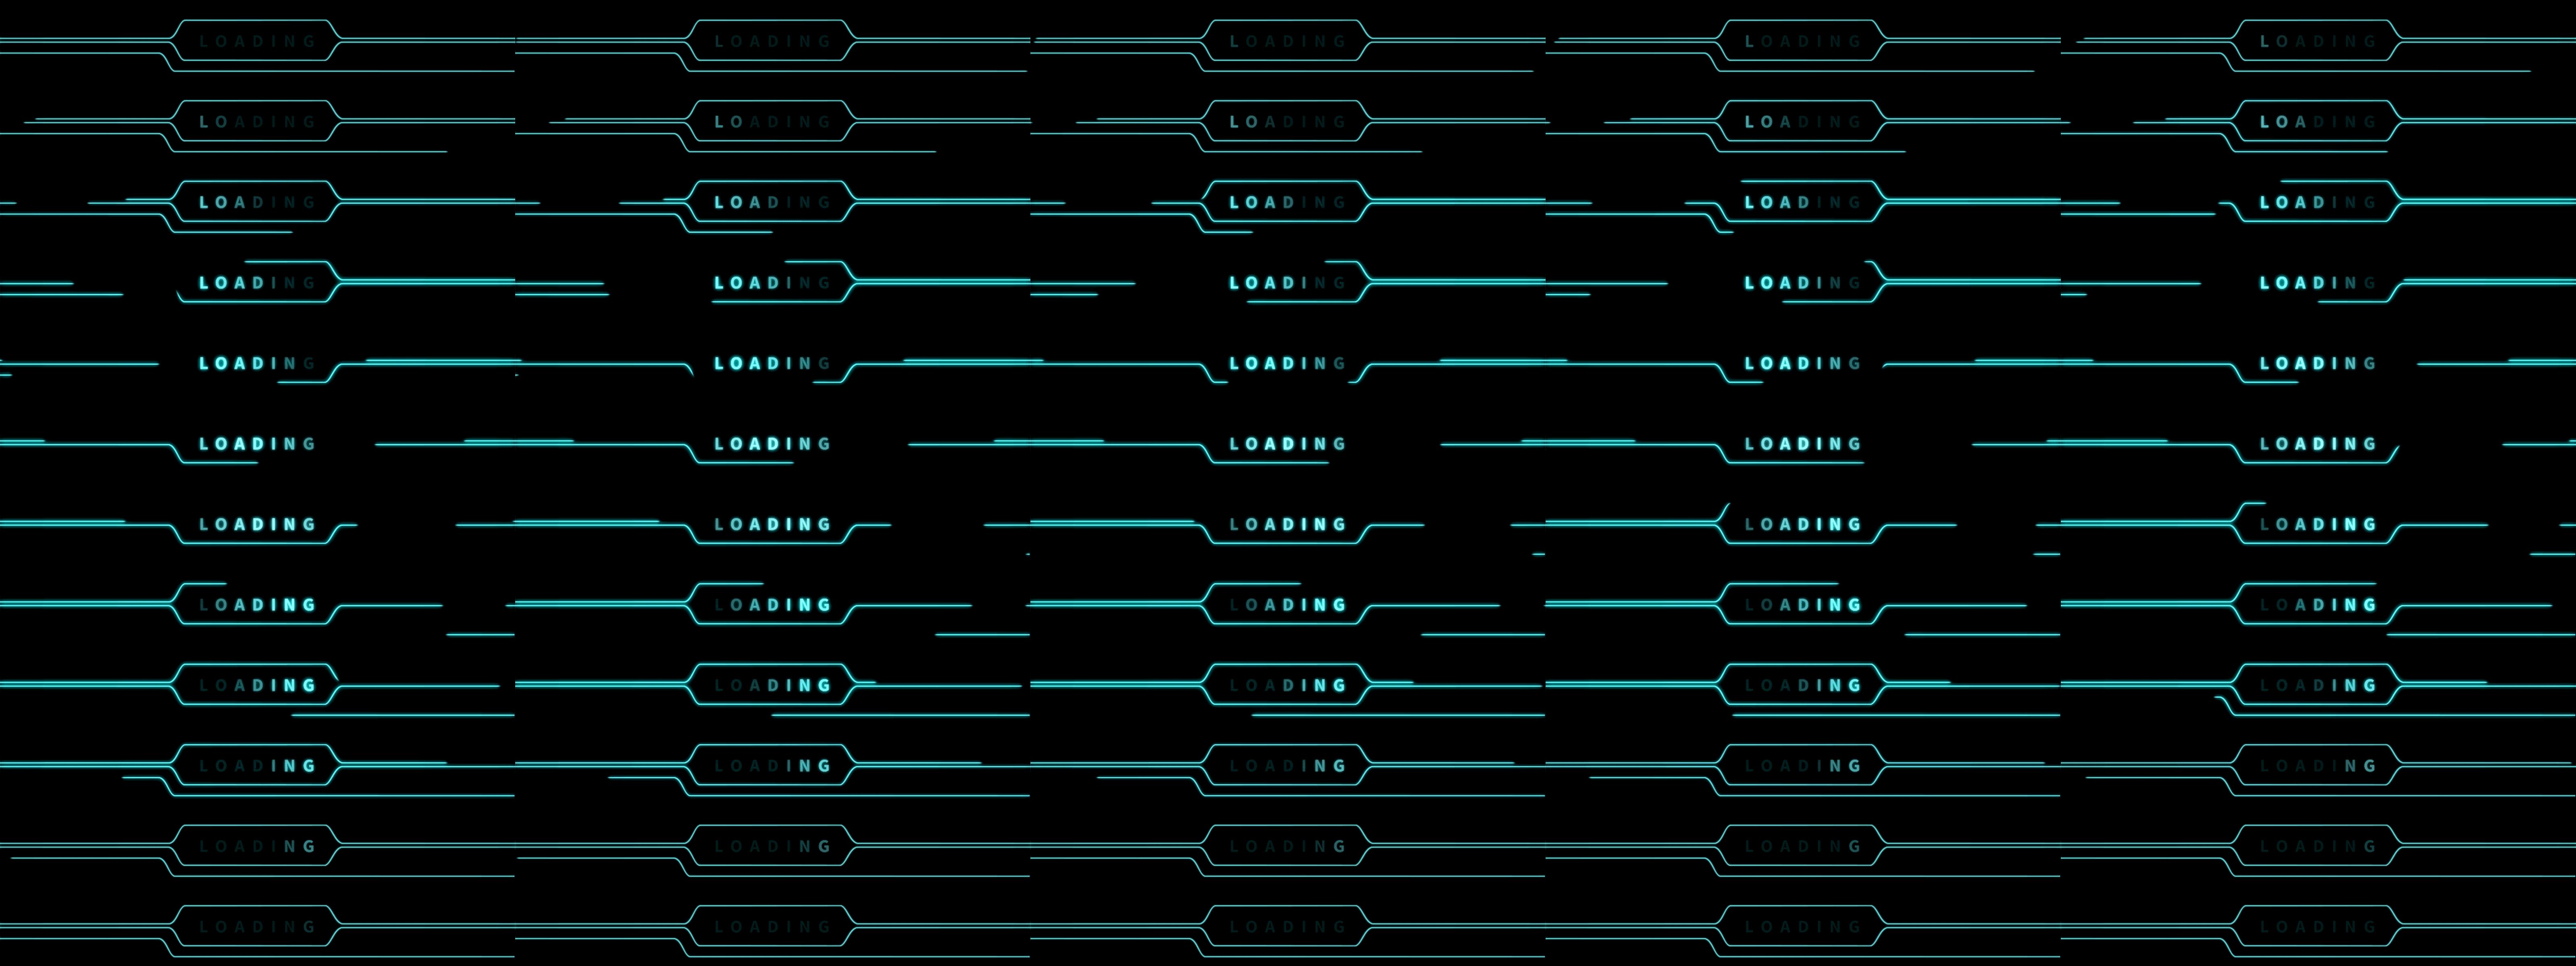 Animated Loading Image plugin for RPG Maker MV by Irina